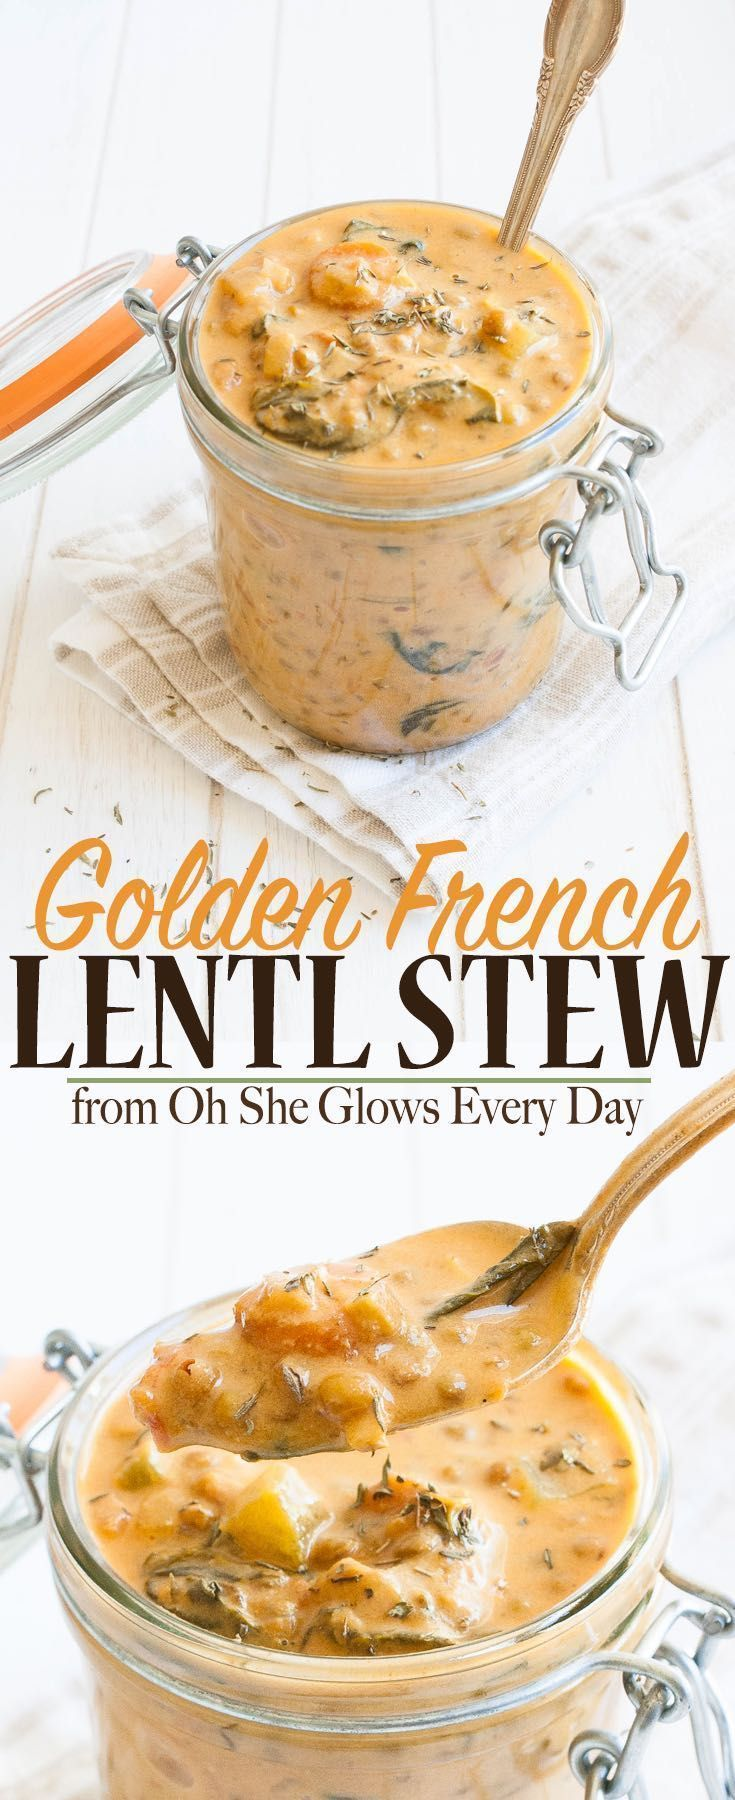 Vegan Lentil Stew | http://www.veggiesdontbite.com | #vegan #plantbased #glutenfree #ohsheglowseveryday via /veggiesdontbite/